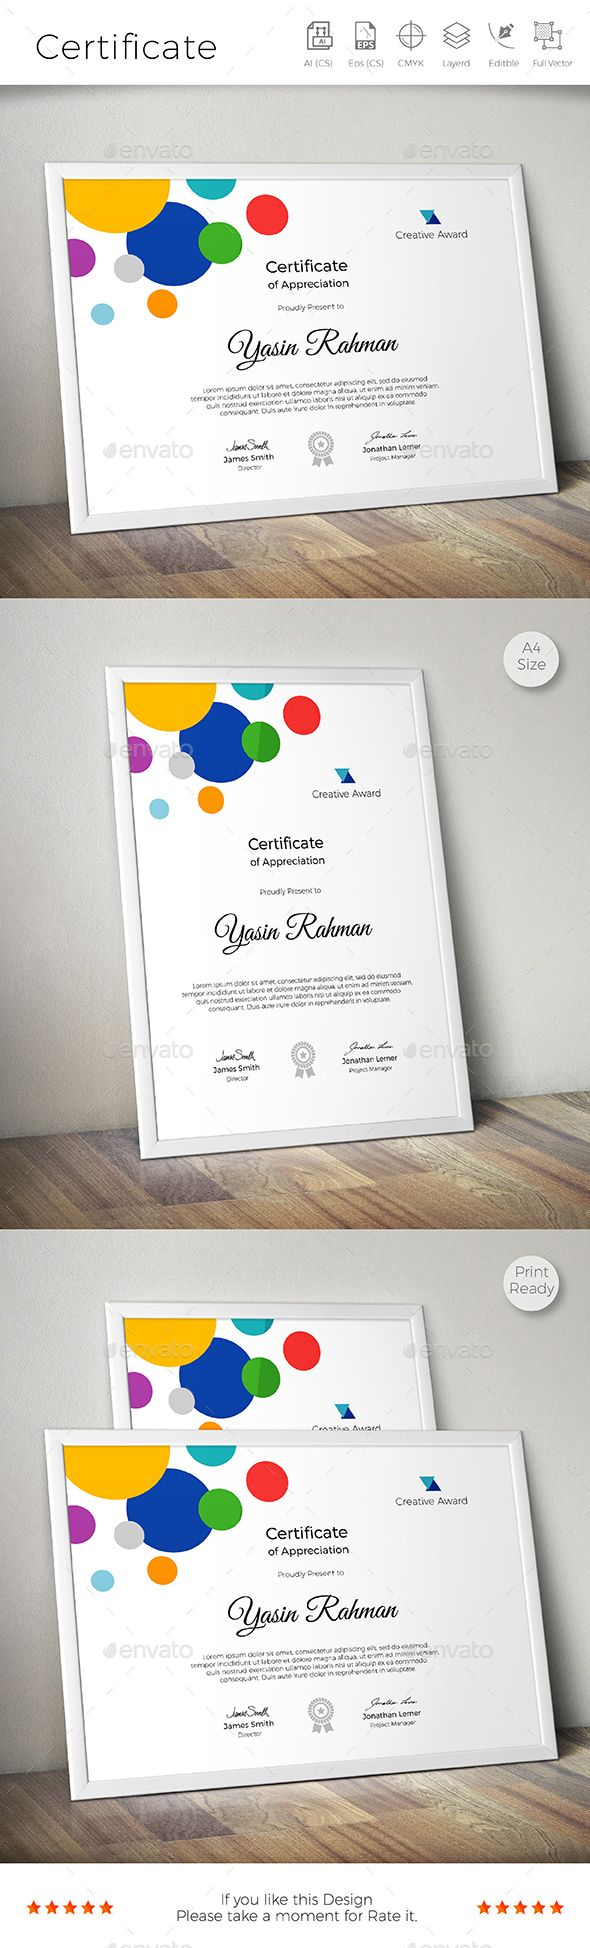 Certificate | Pinterest